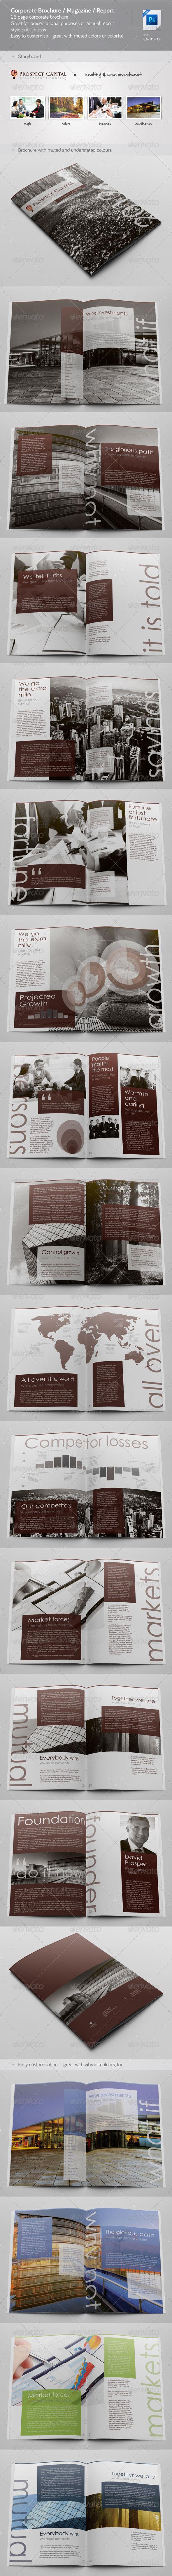 Corporate Brochure / Magazine / Annual Report - Corporate Brochures